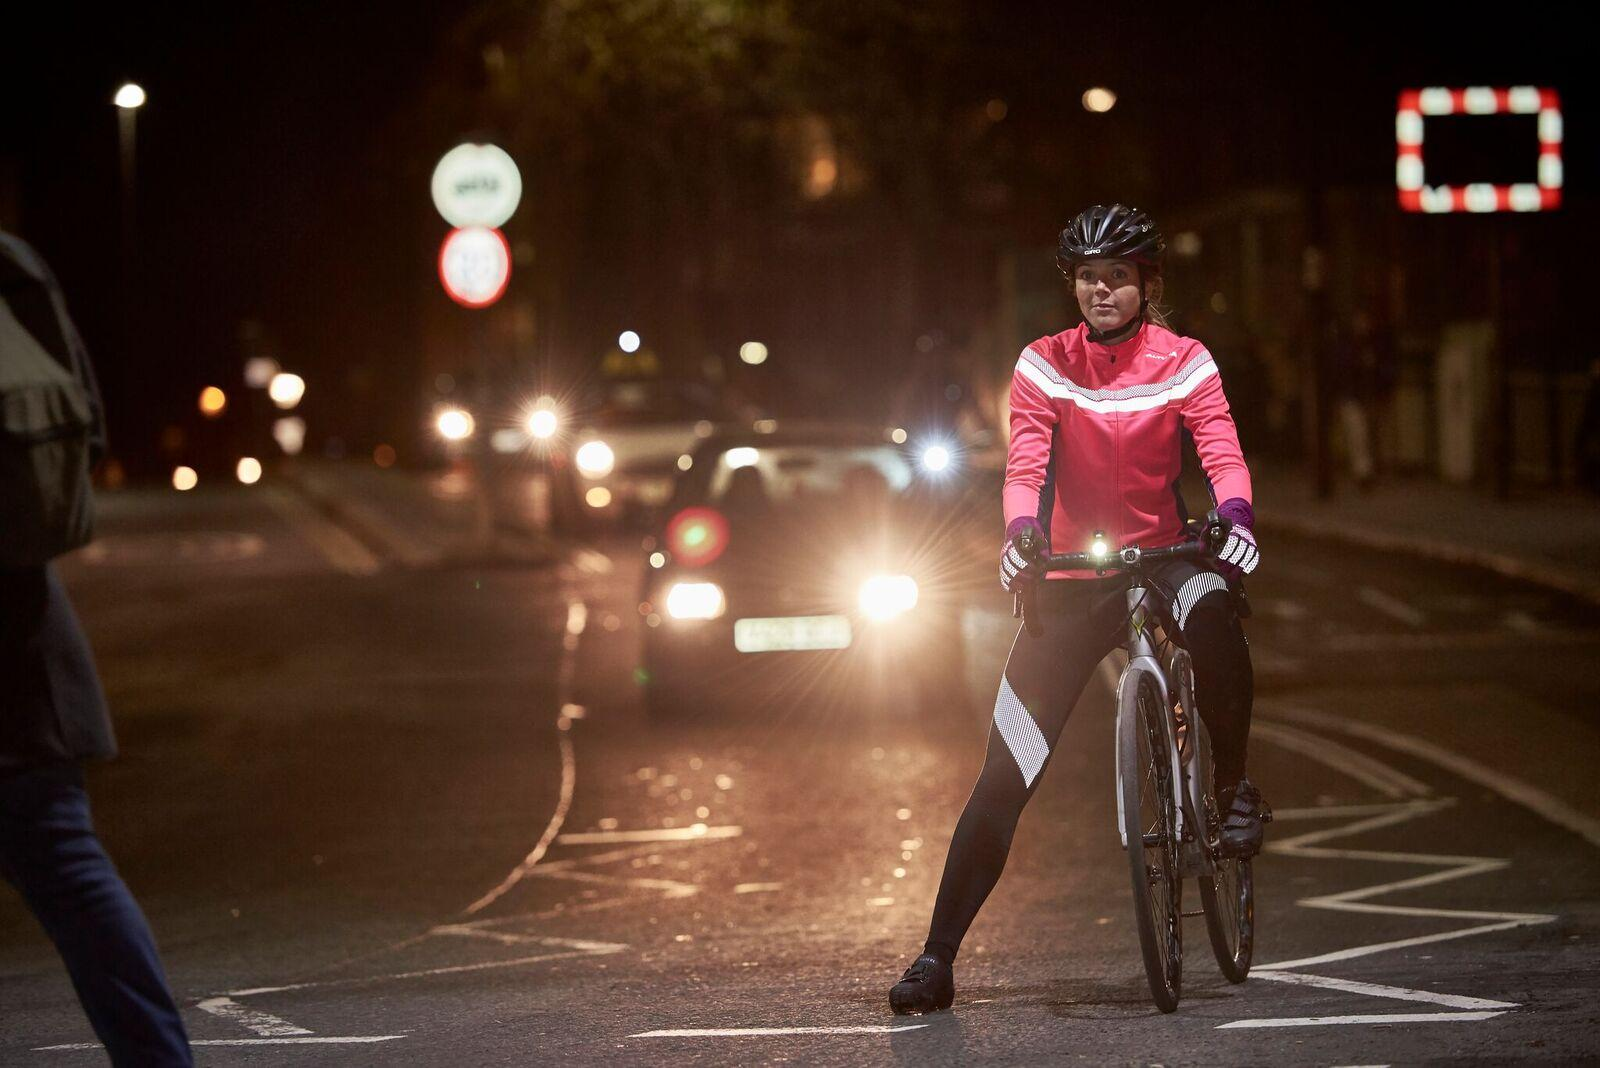 Good riding practice at night